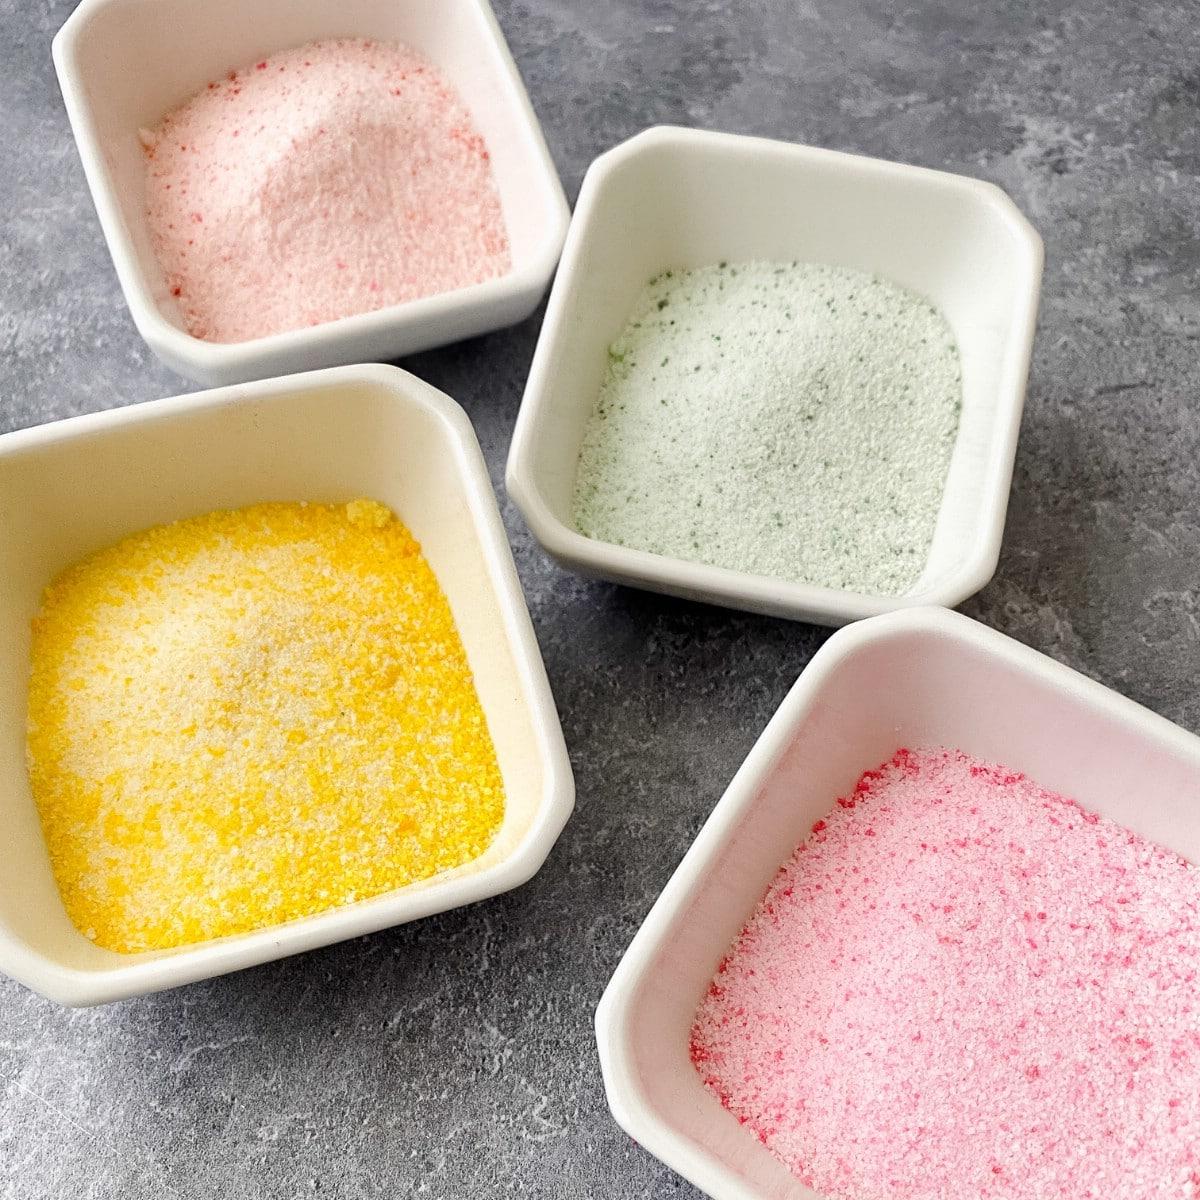 Pastel sanding sugar in white bowls